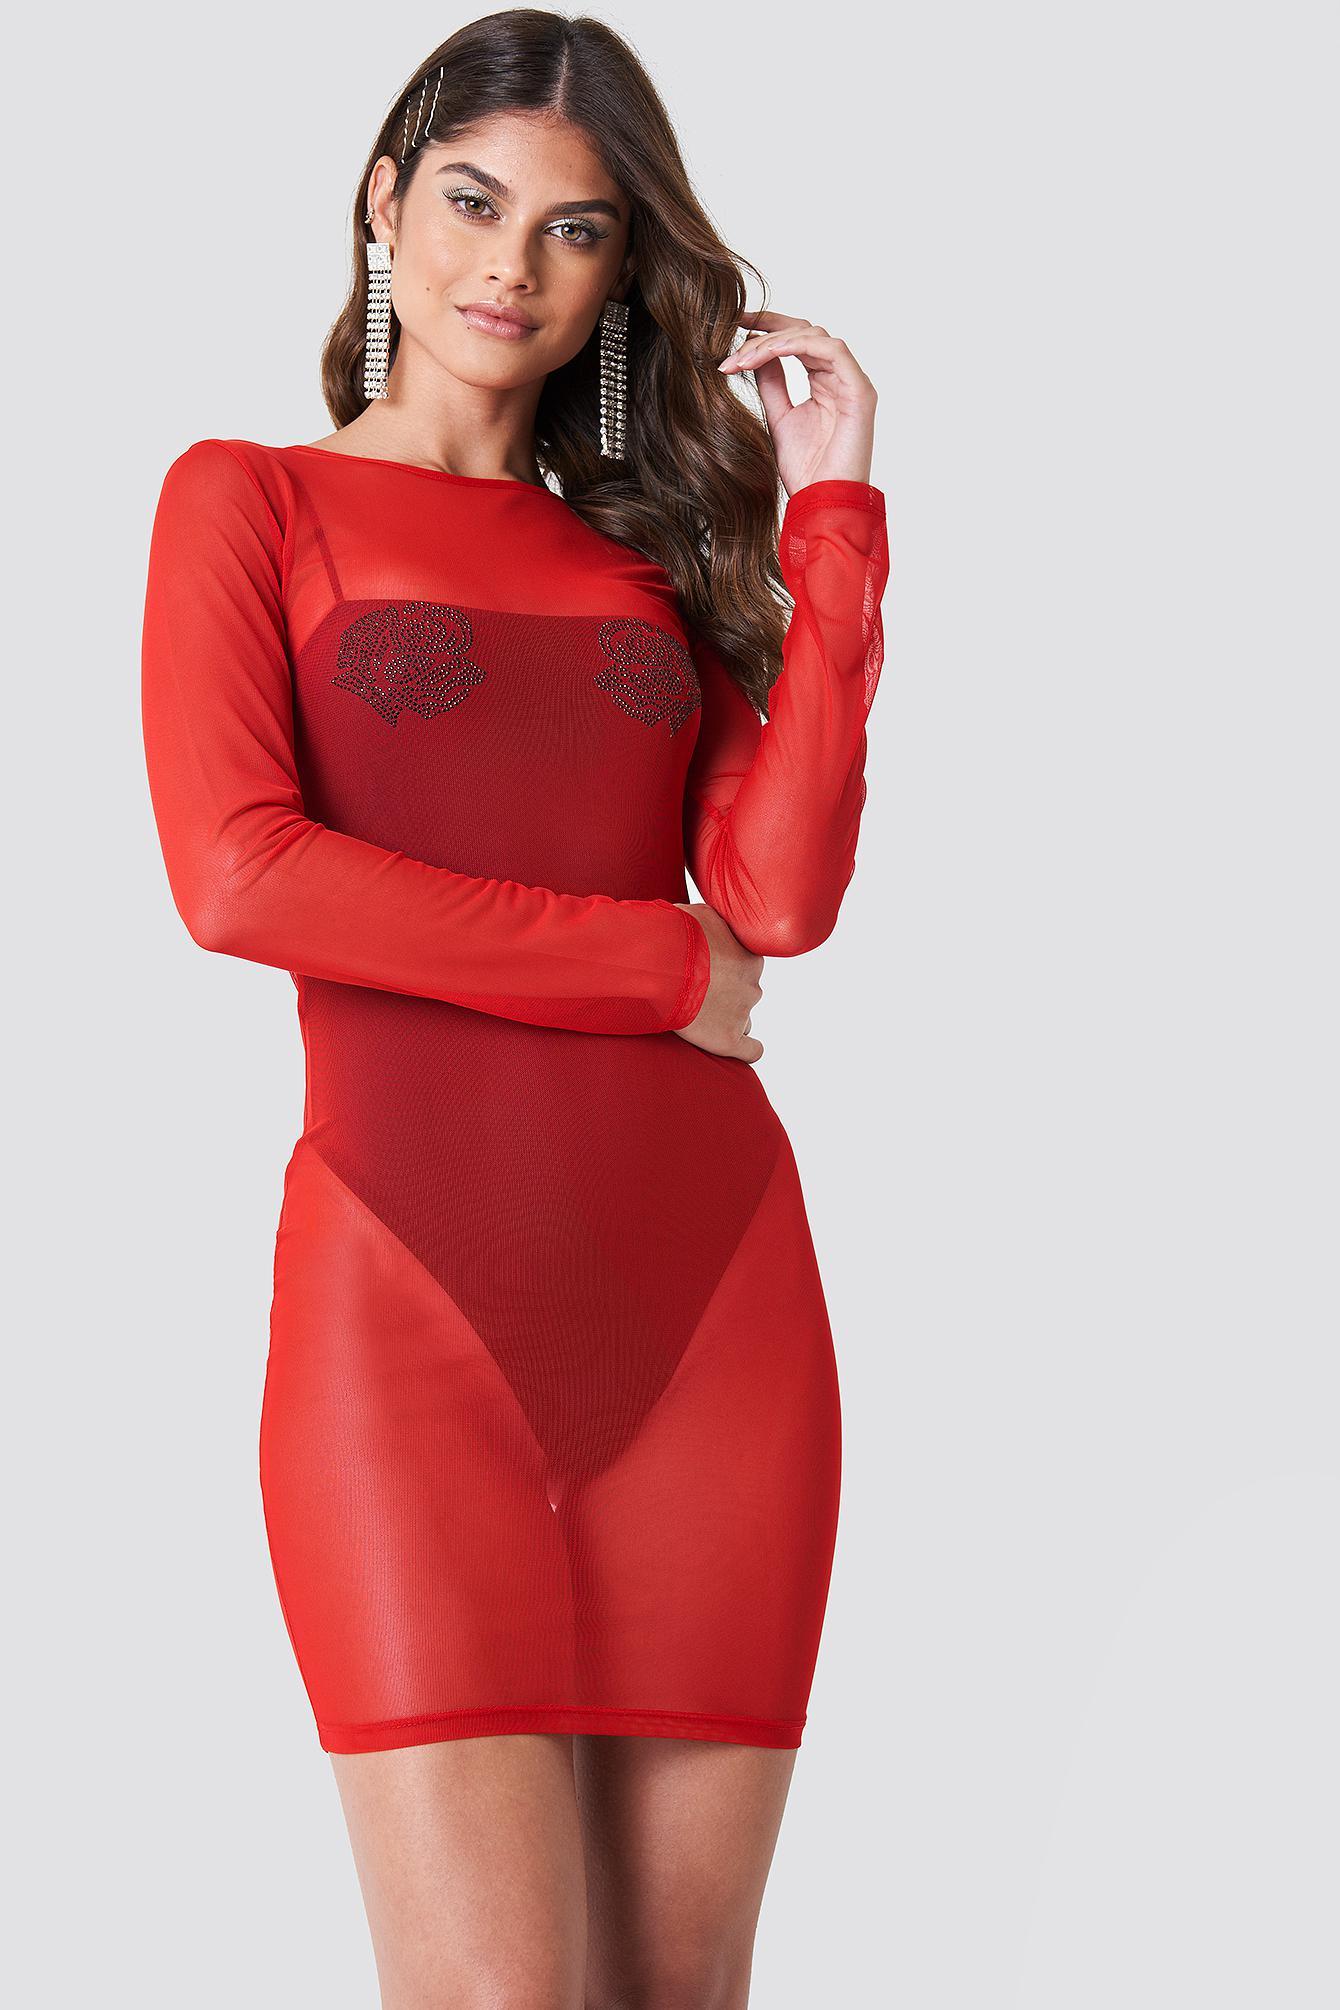 2f9a9231d1263 Lyst - NA-KD Rhinestone Rose Mesh Dress Hot Lips in Red